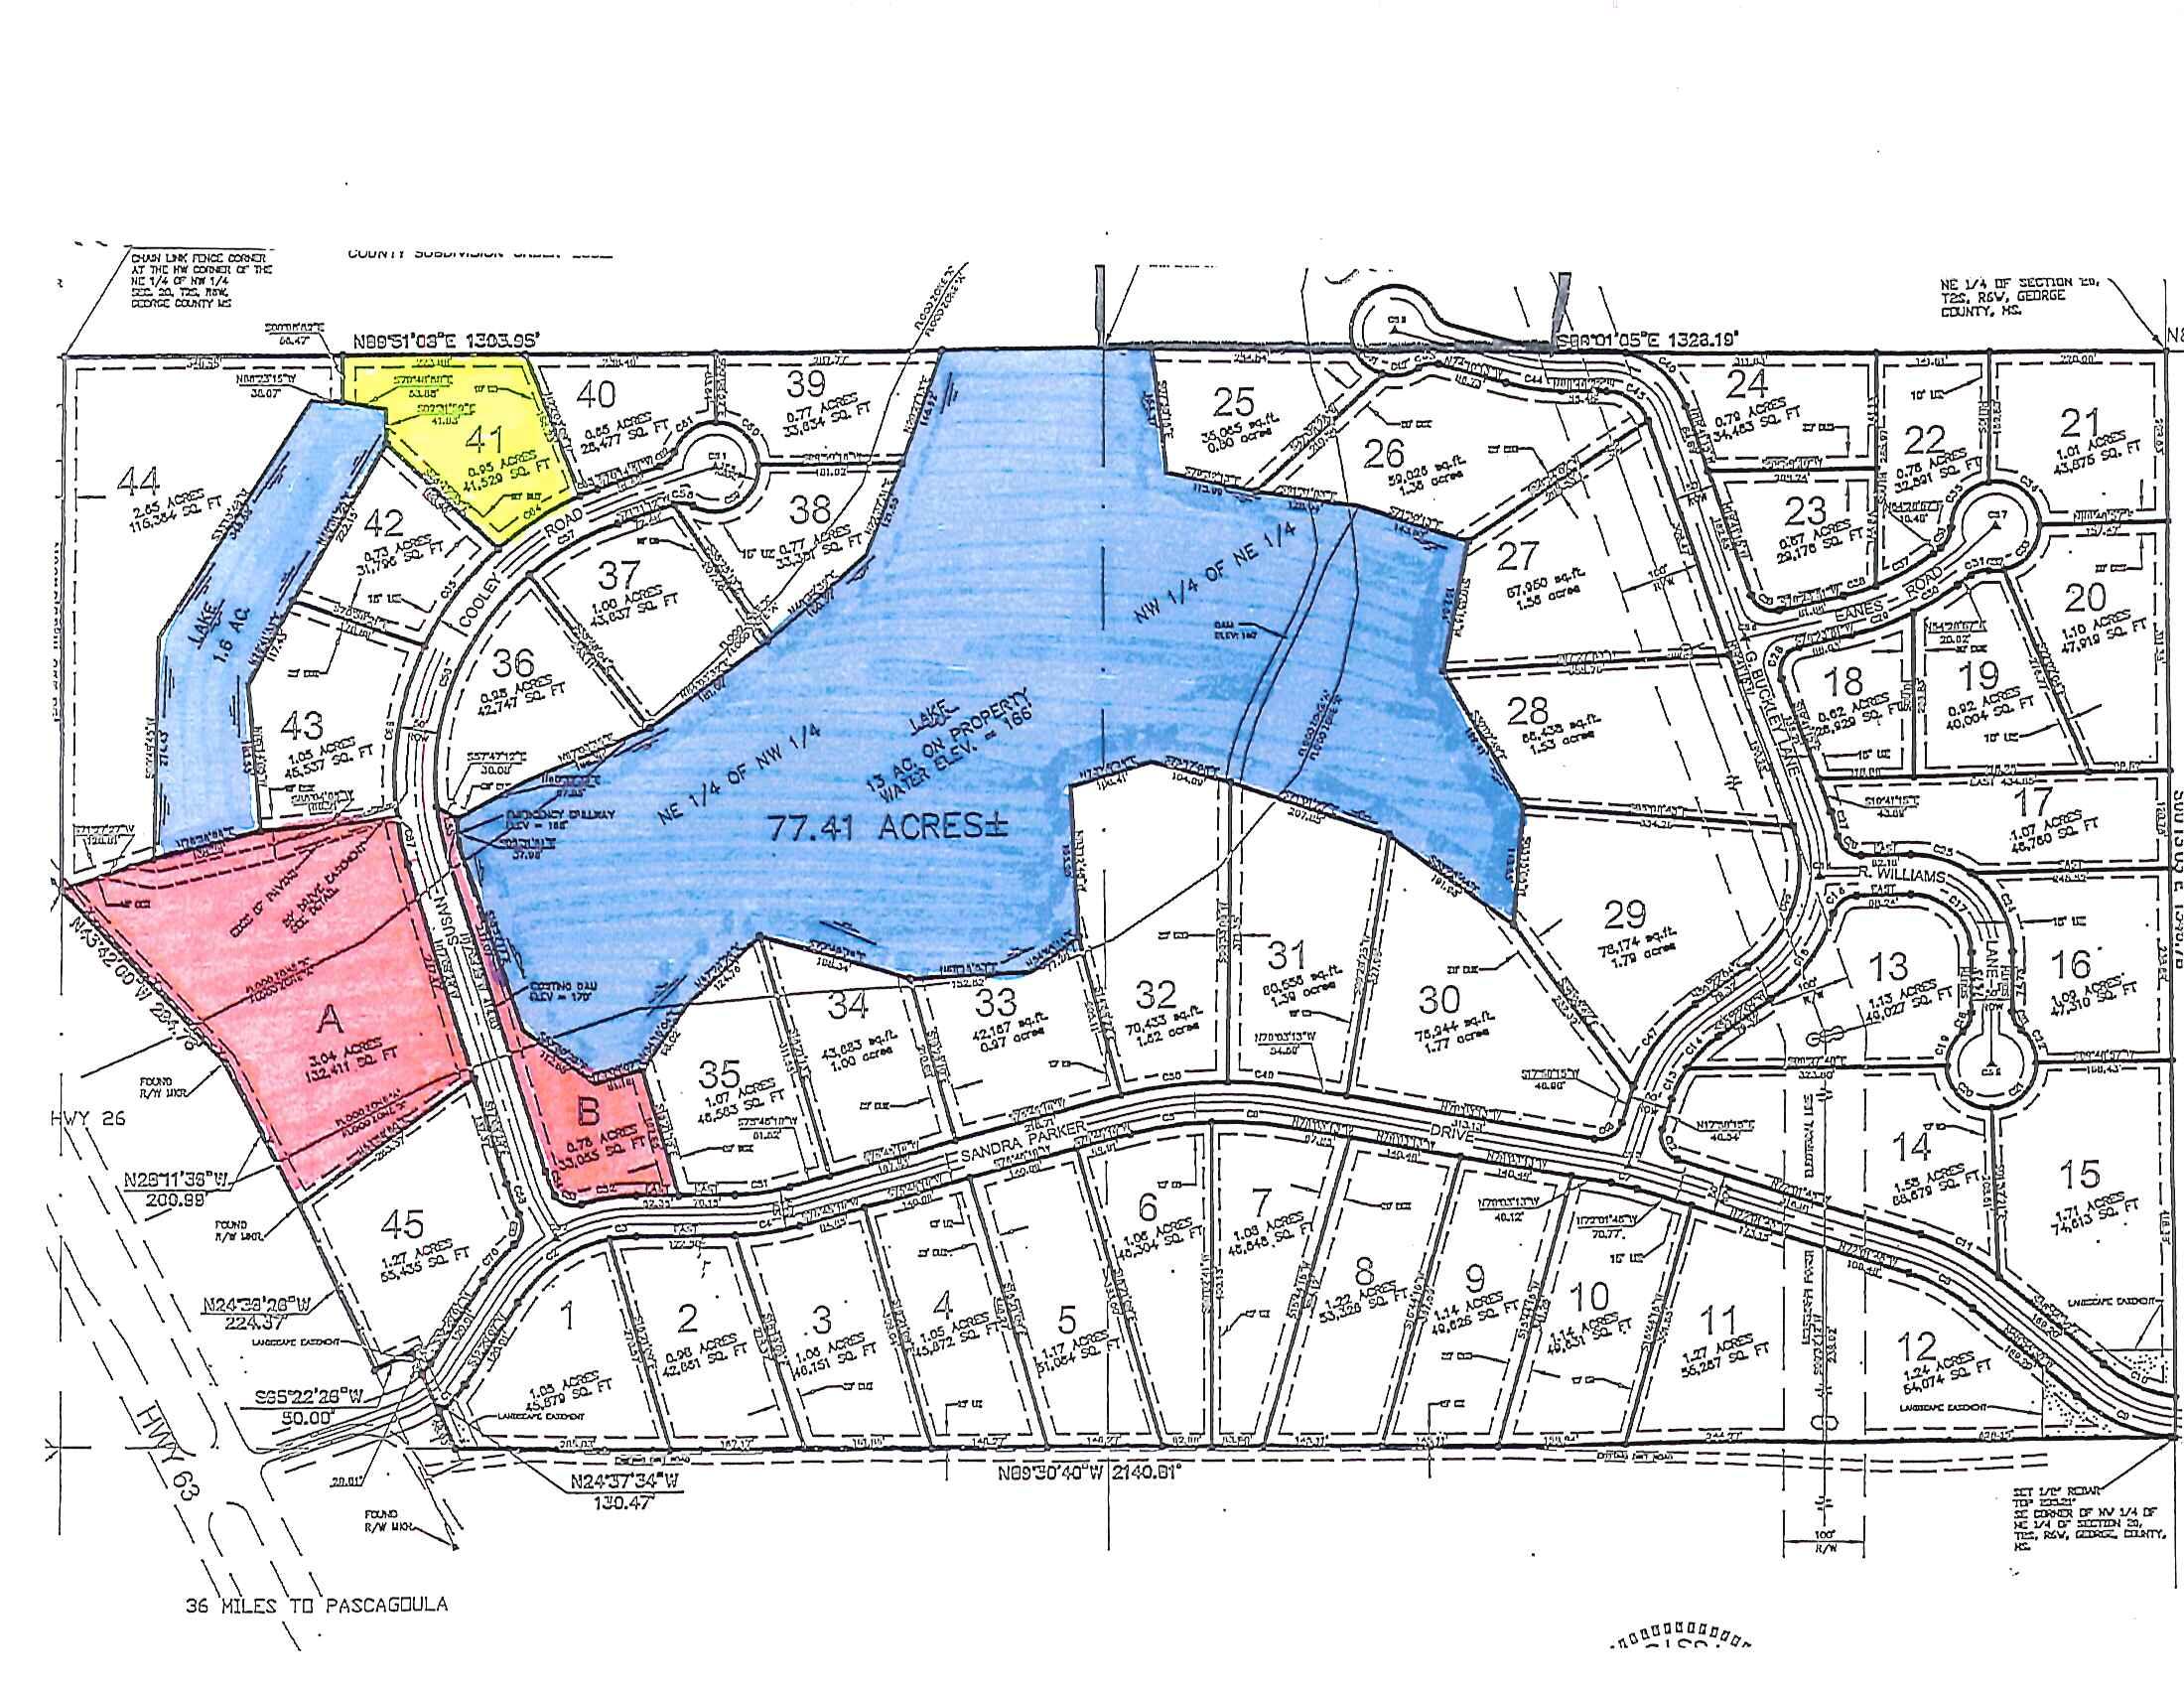 Lot 41 Susan Cooley Rd, Lucedale, Mississippi 39452